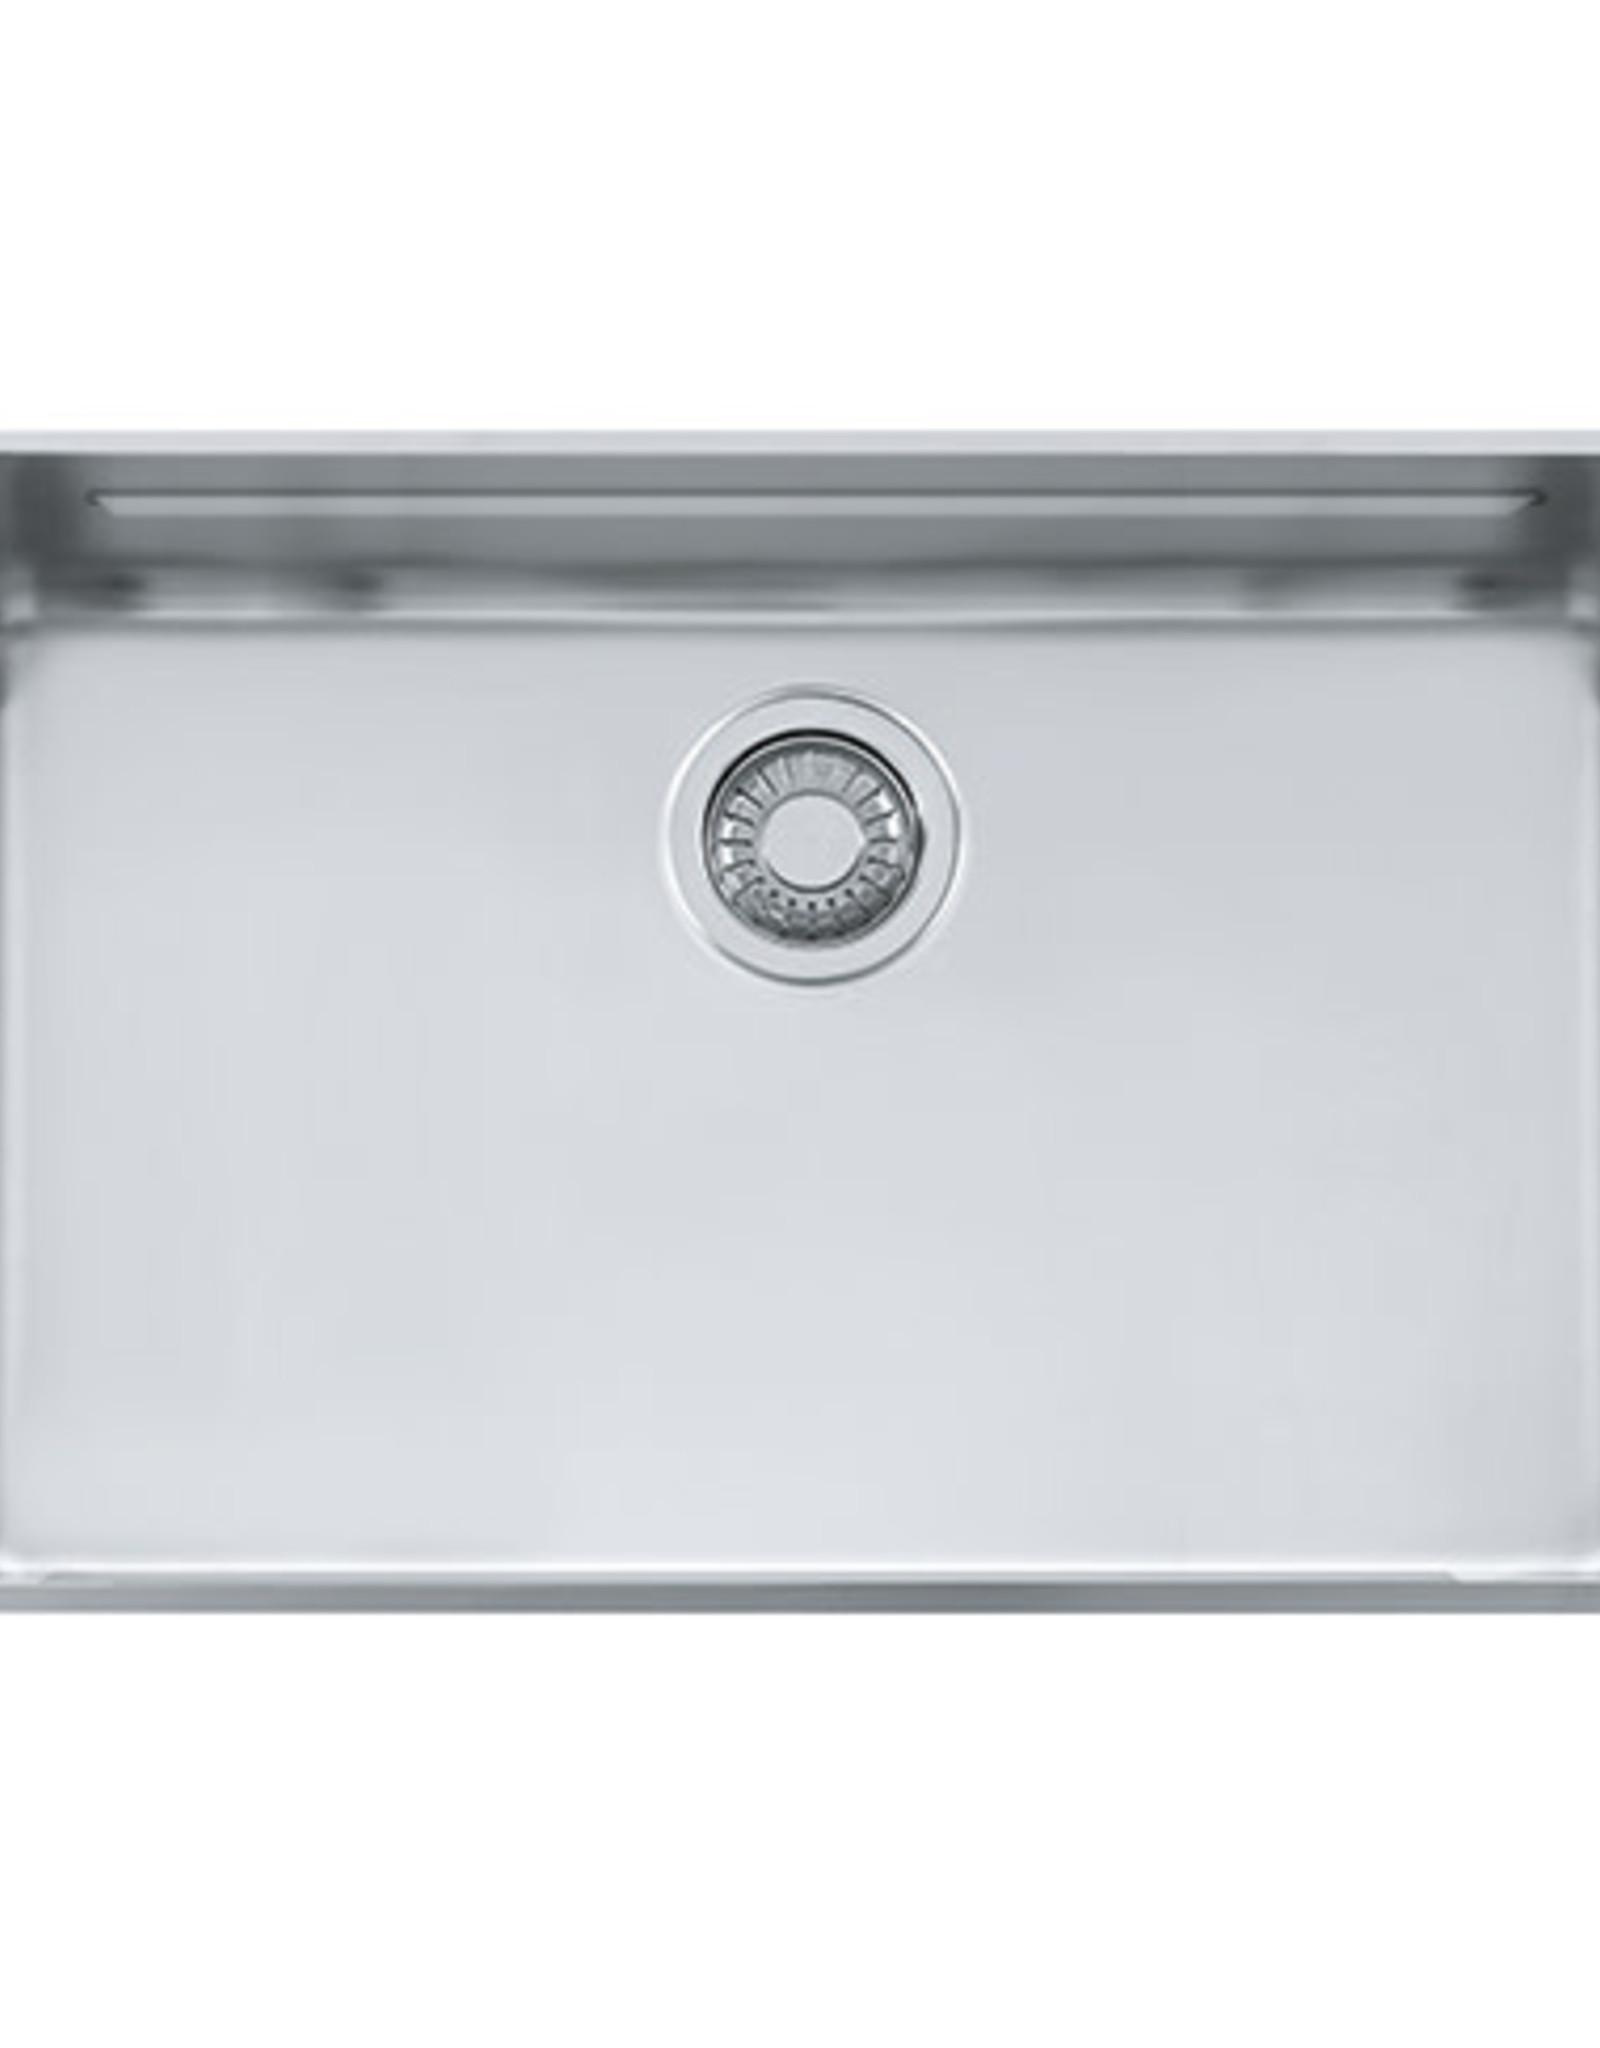 franke franke kubus kbx110 28 stainless steel undermount kitchen sink